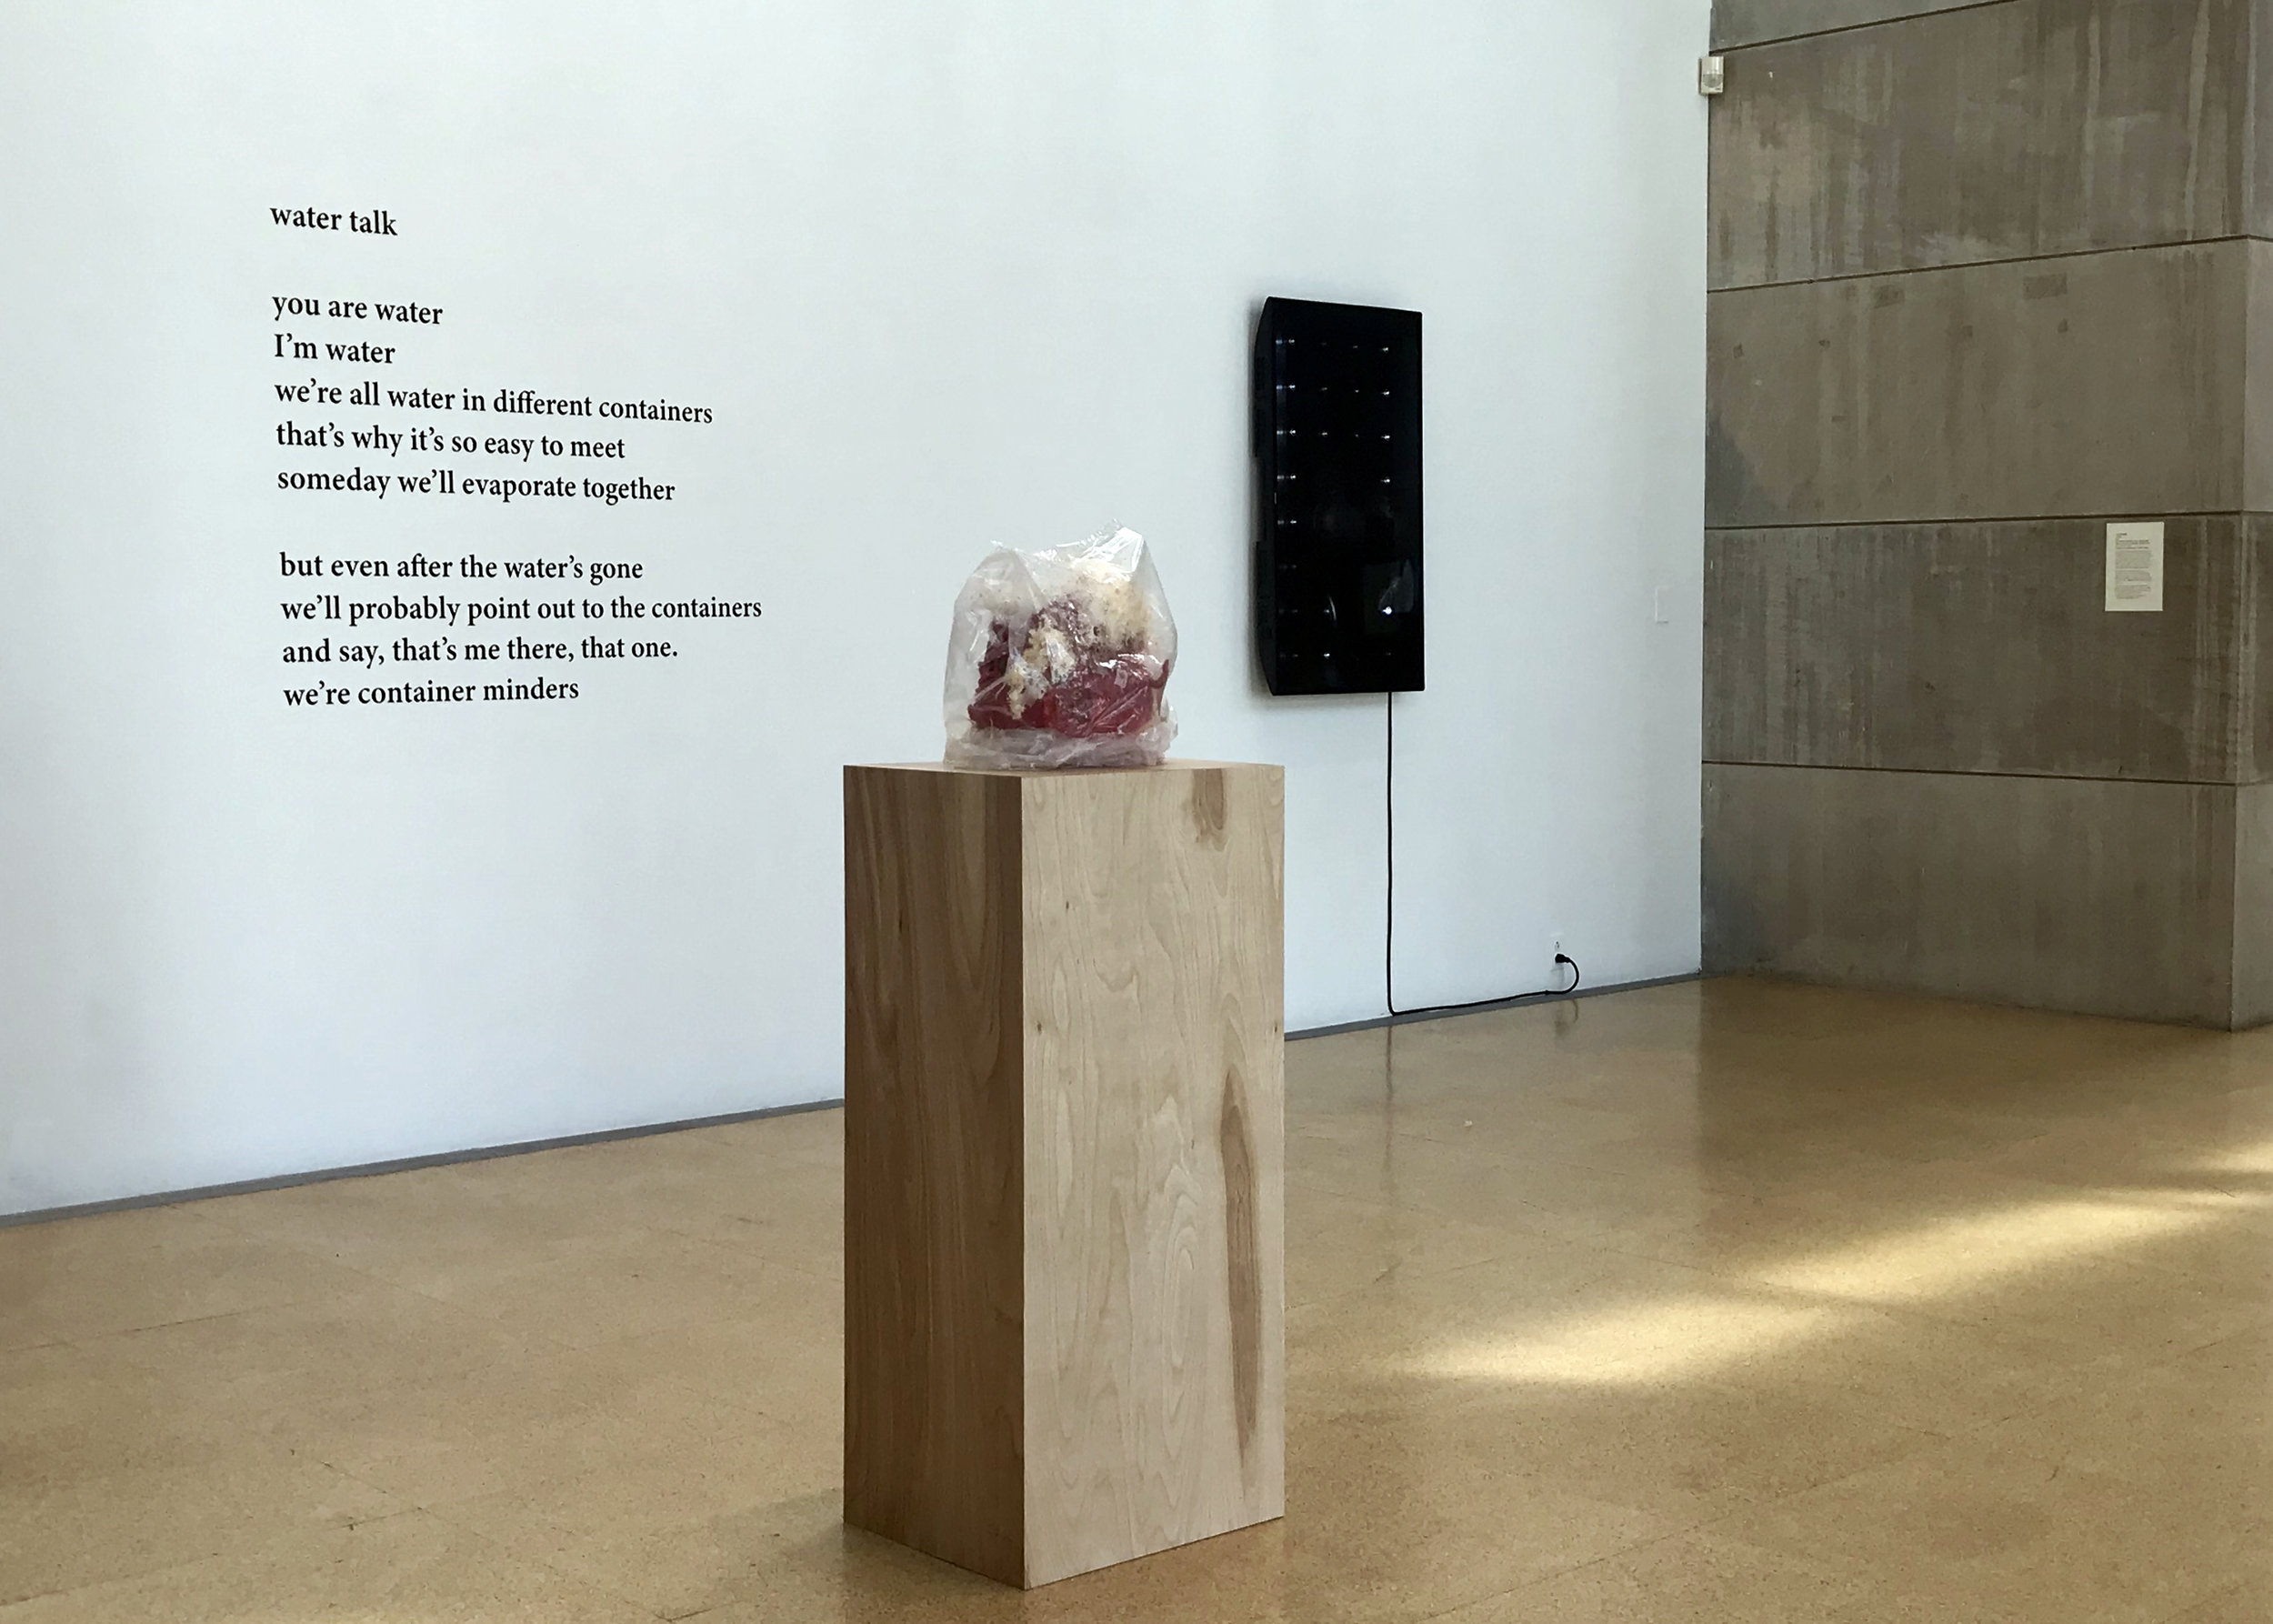 Audible Bacillus  installation view with Yoko Ono, Candice Lin, and Josh Tonsfeldt (left to right). Image: J. Gleisner.